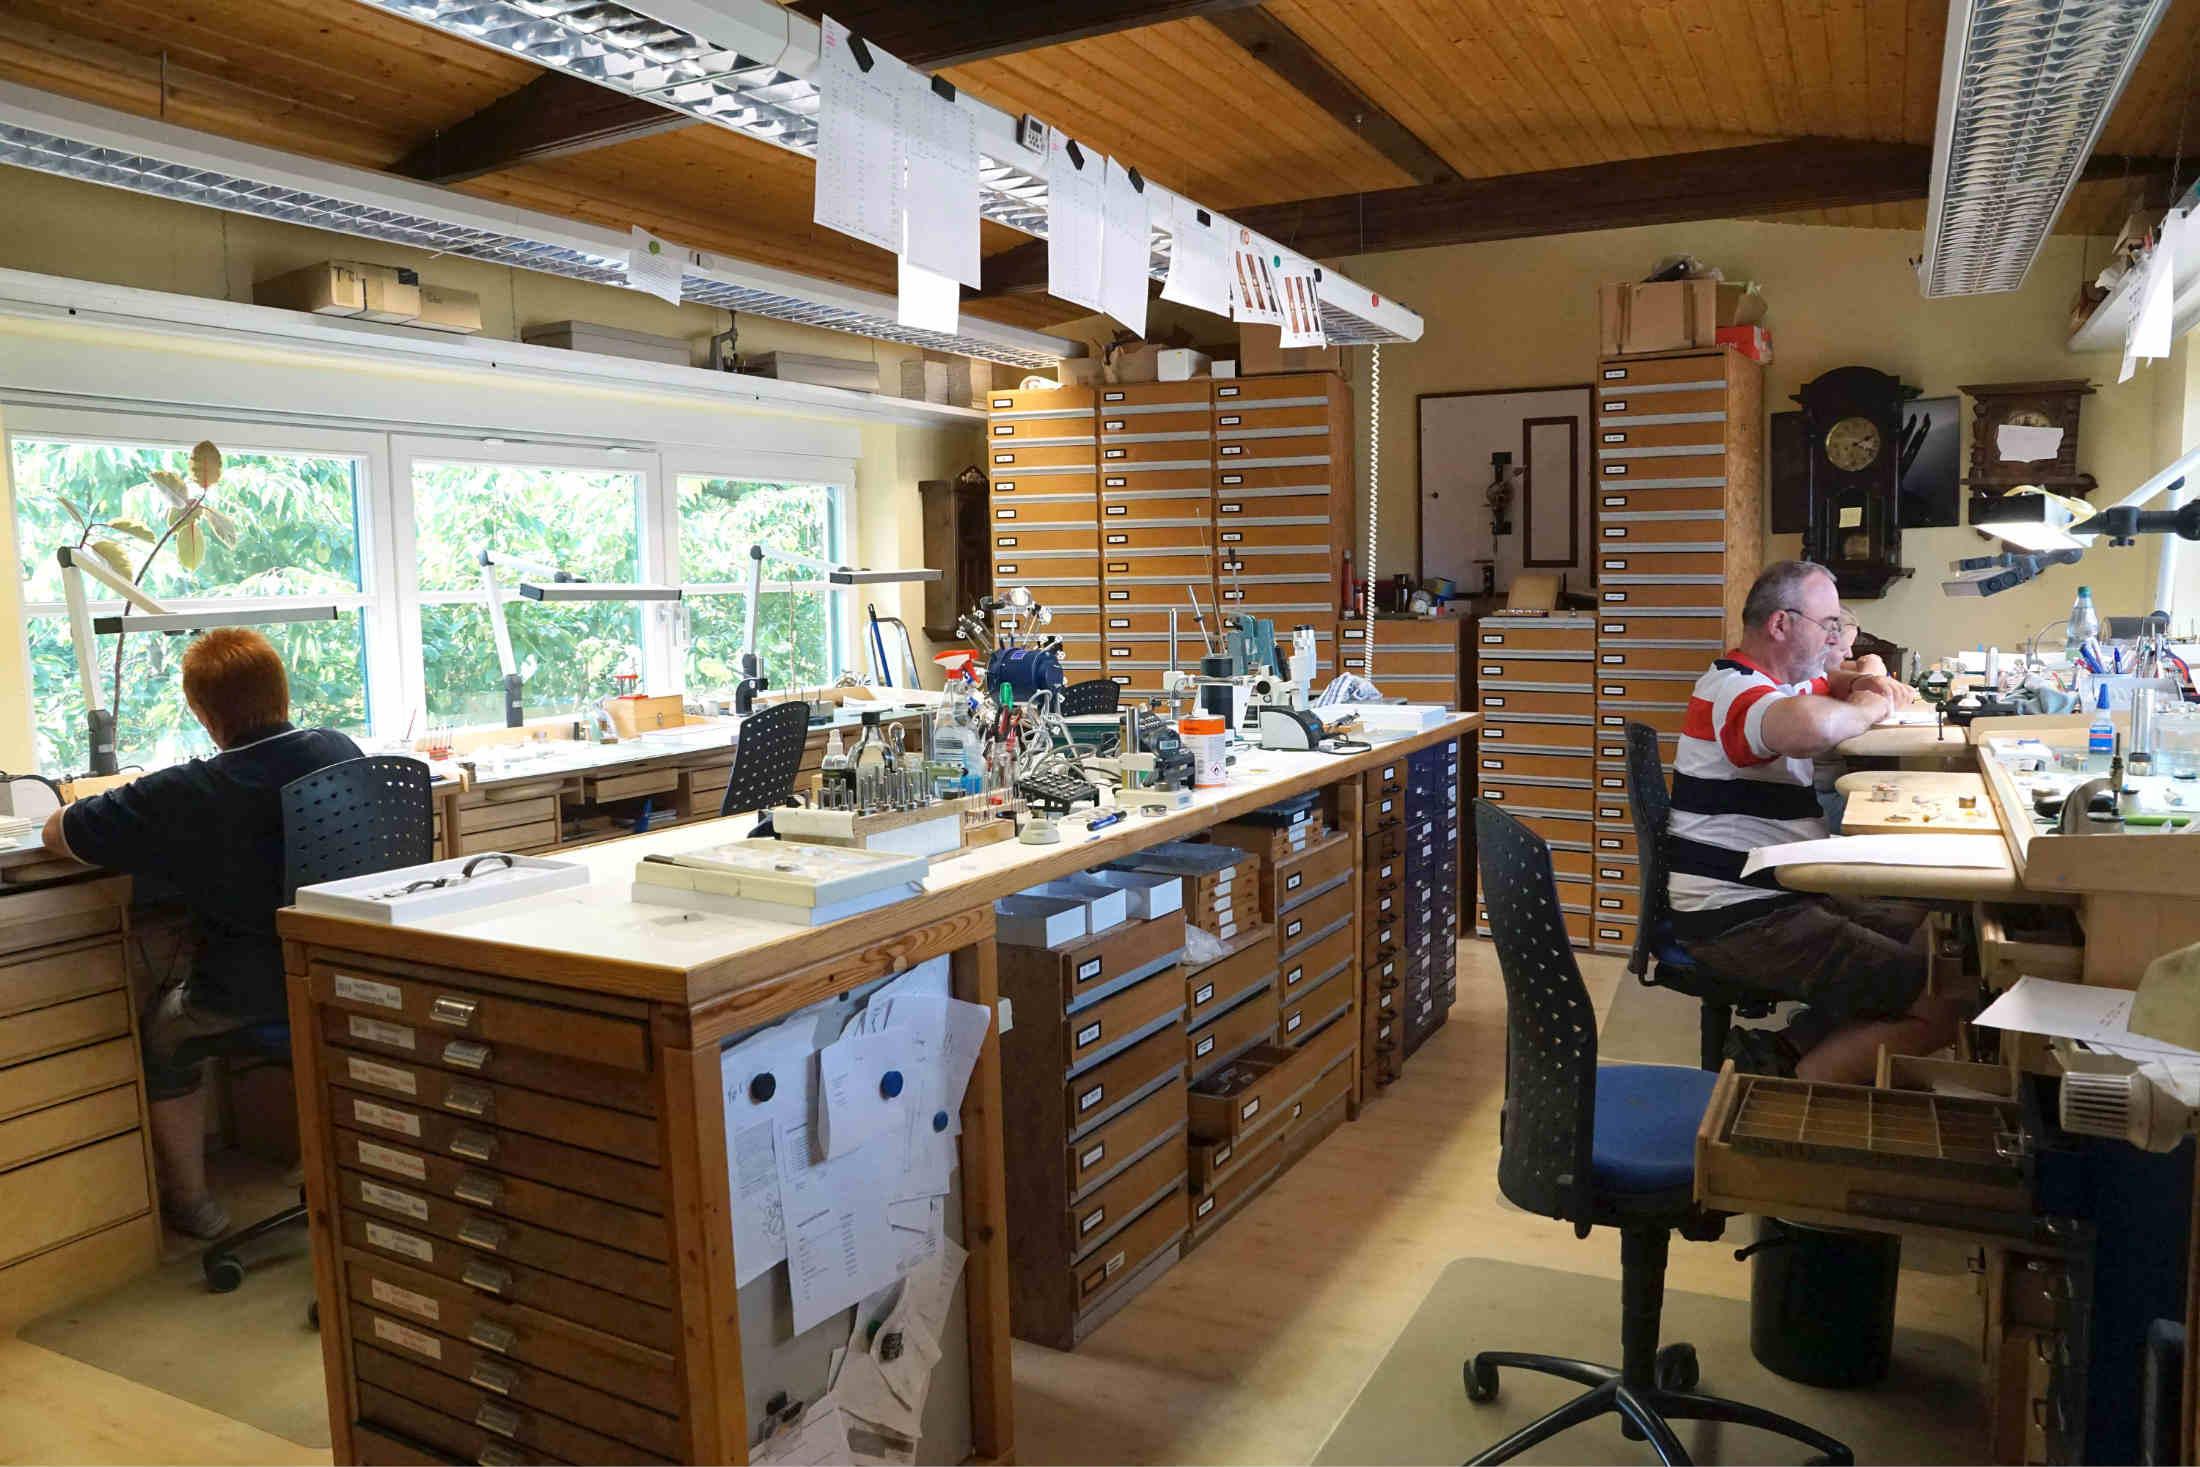 German watchmakers Dornbluth & Sohn